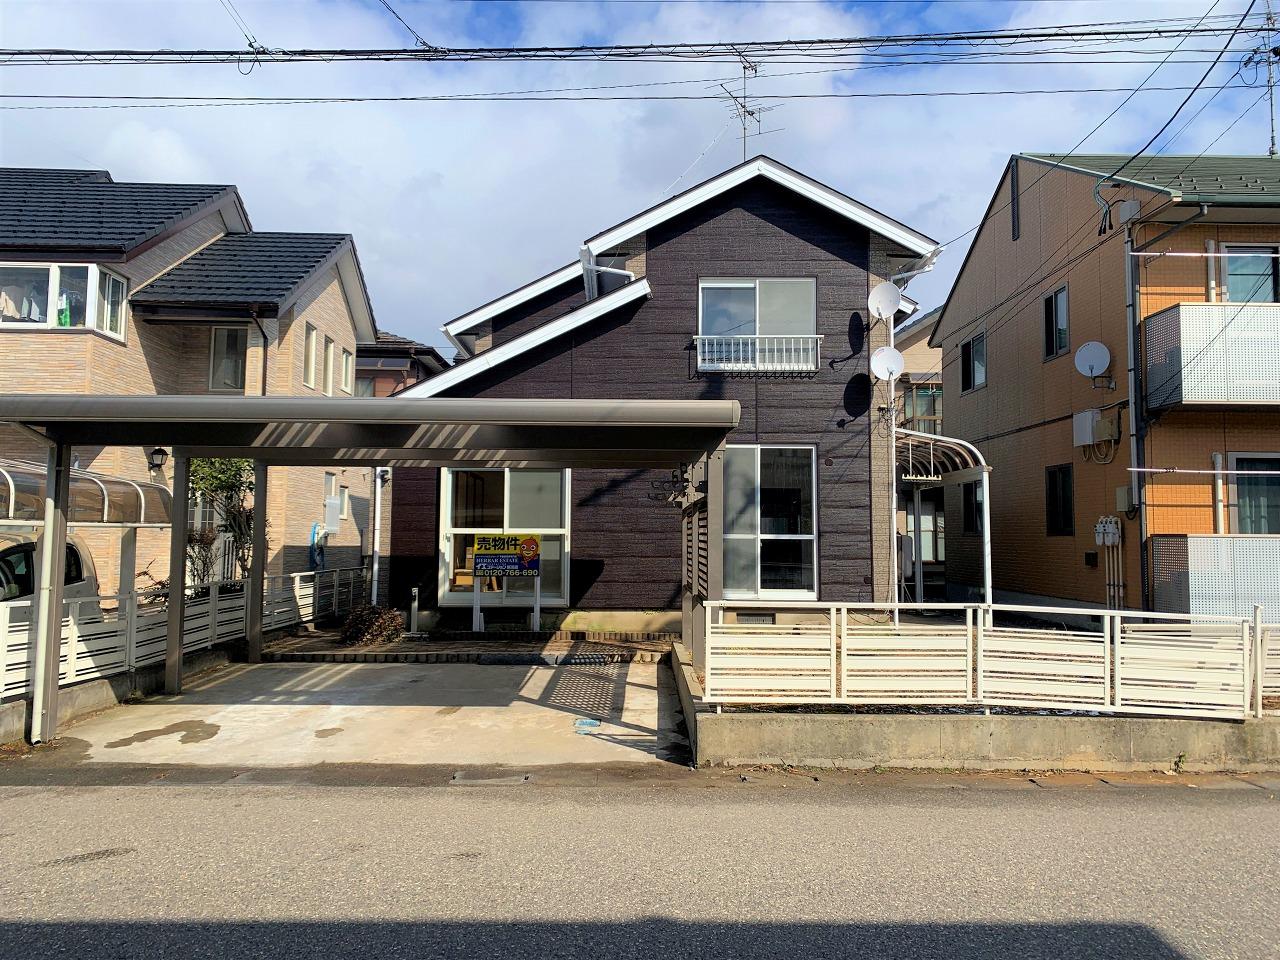 新潟市北区須戸の【中古住宅】不動産情報の写真